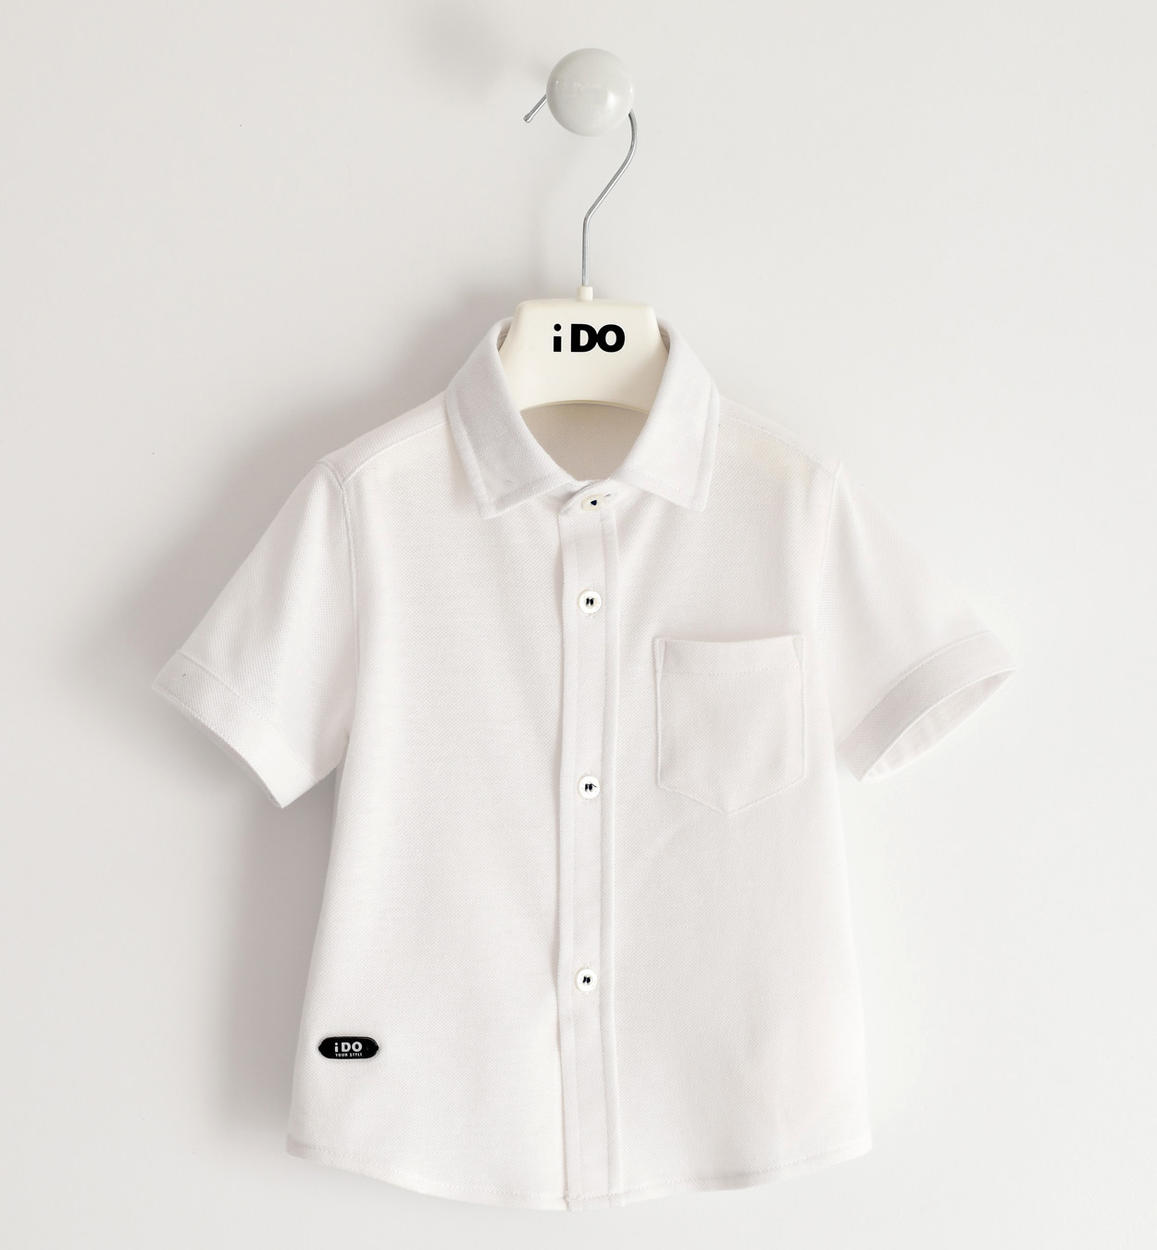 fiú fehér rövid ujjú ing